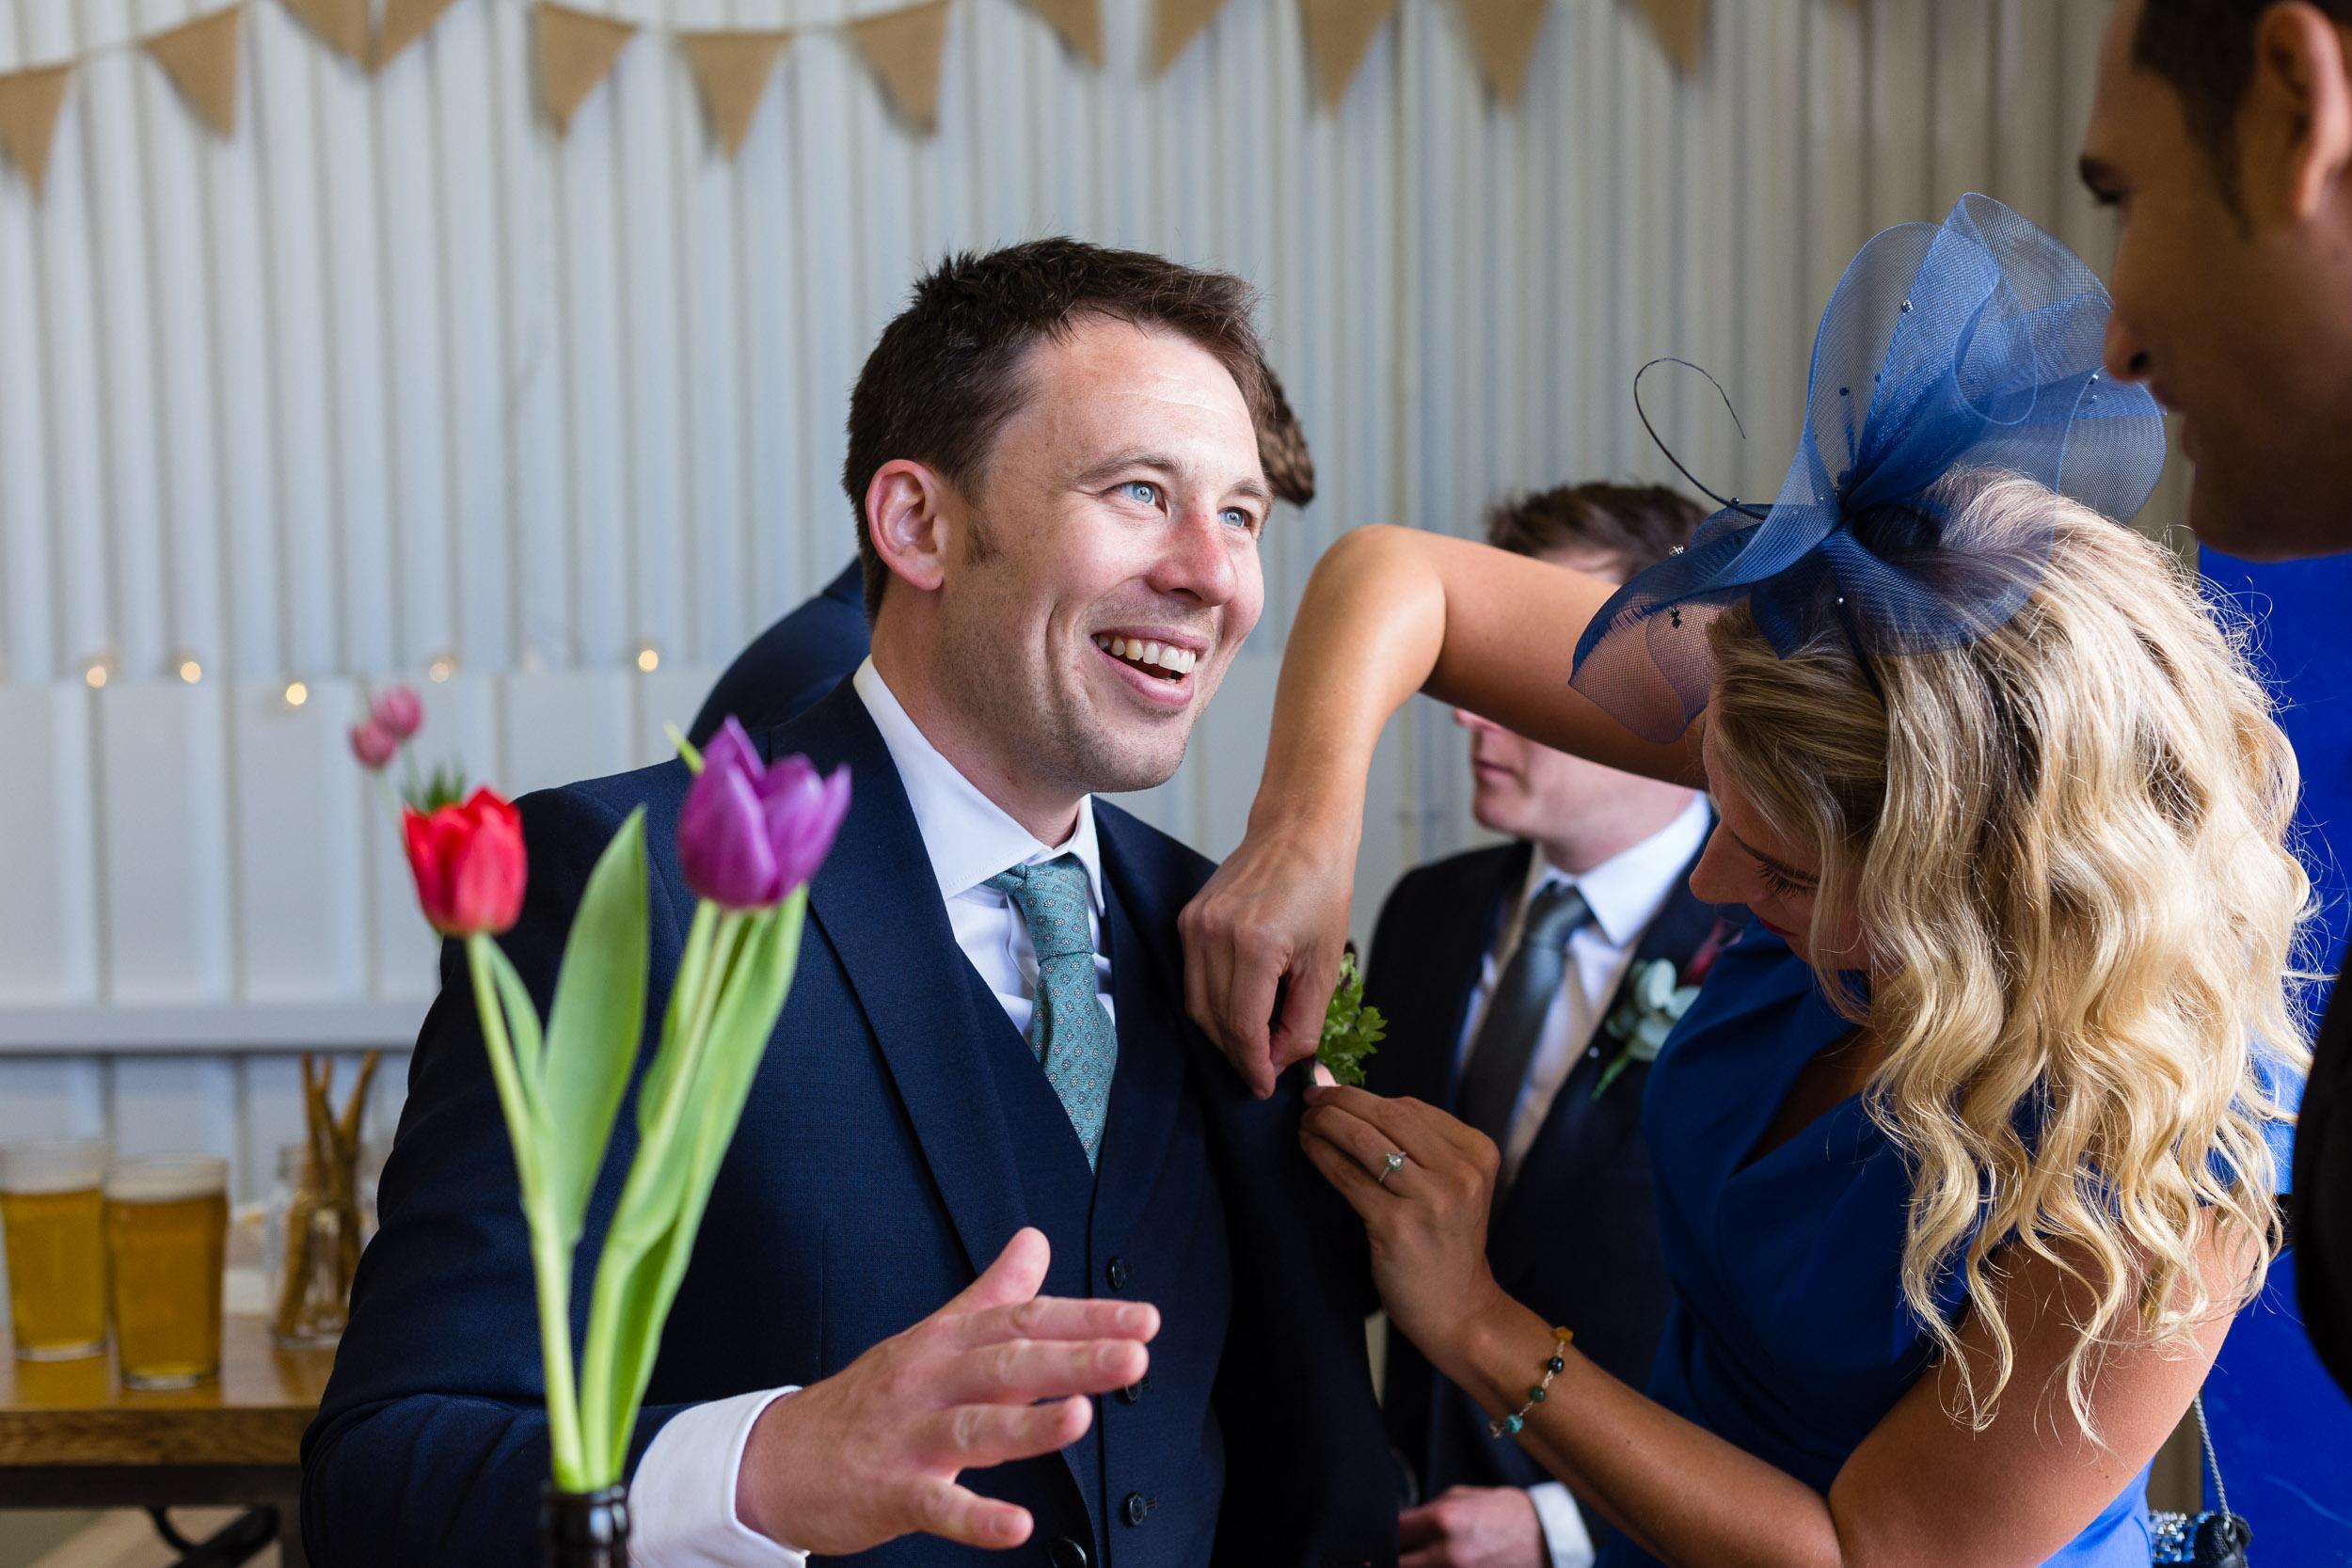 brockwell-lido-brixton-herne-hill-wedding-010.jpg